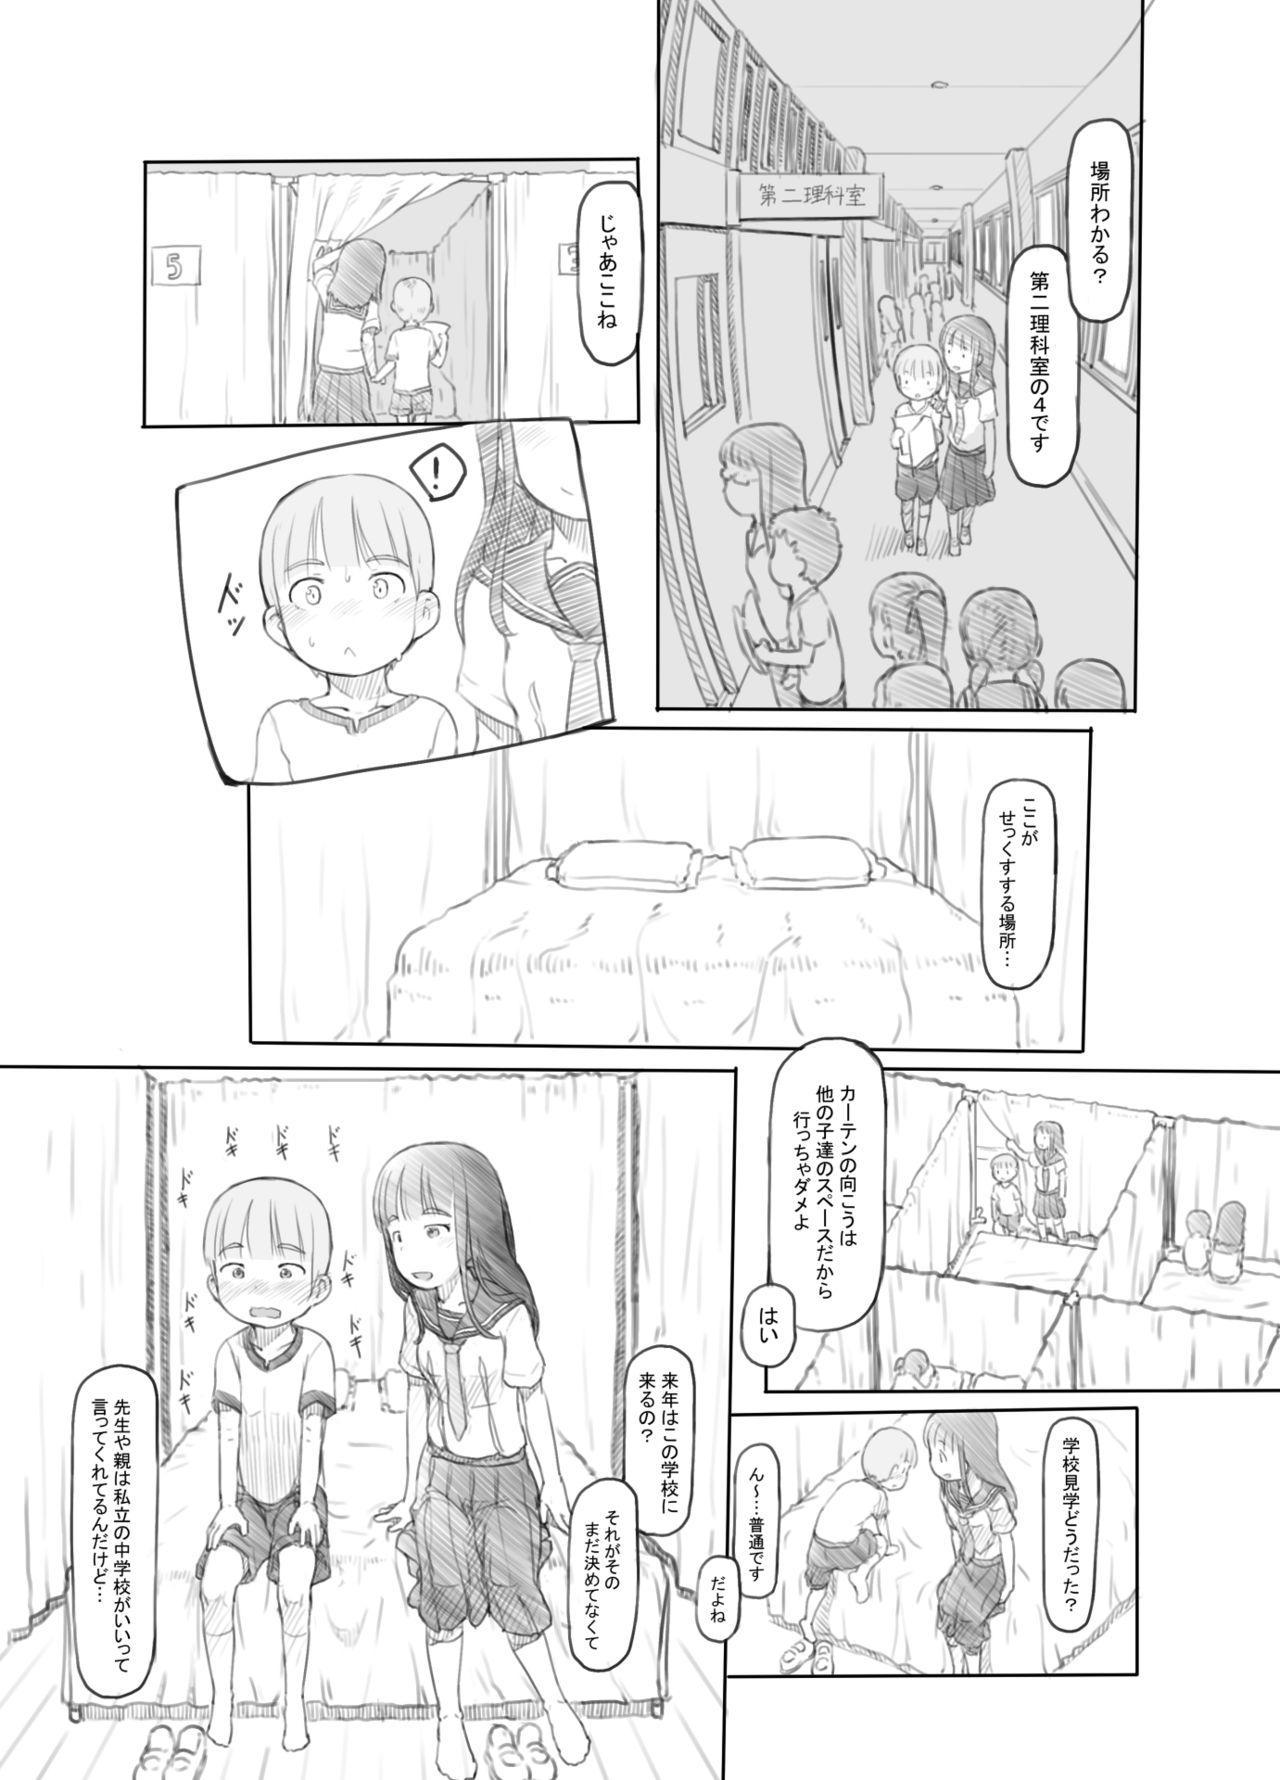 OneShota Sex Jisshuu 11